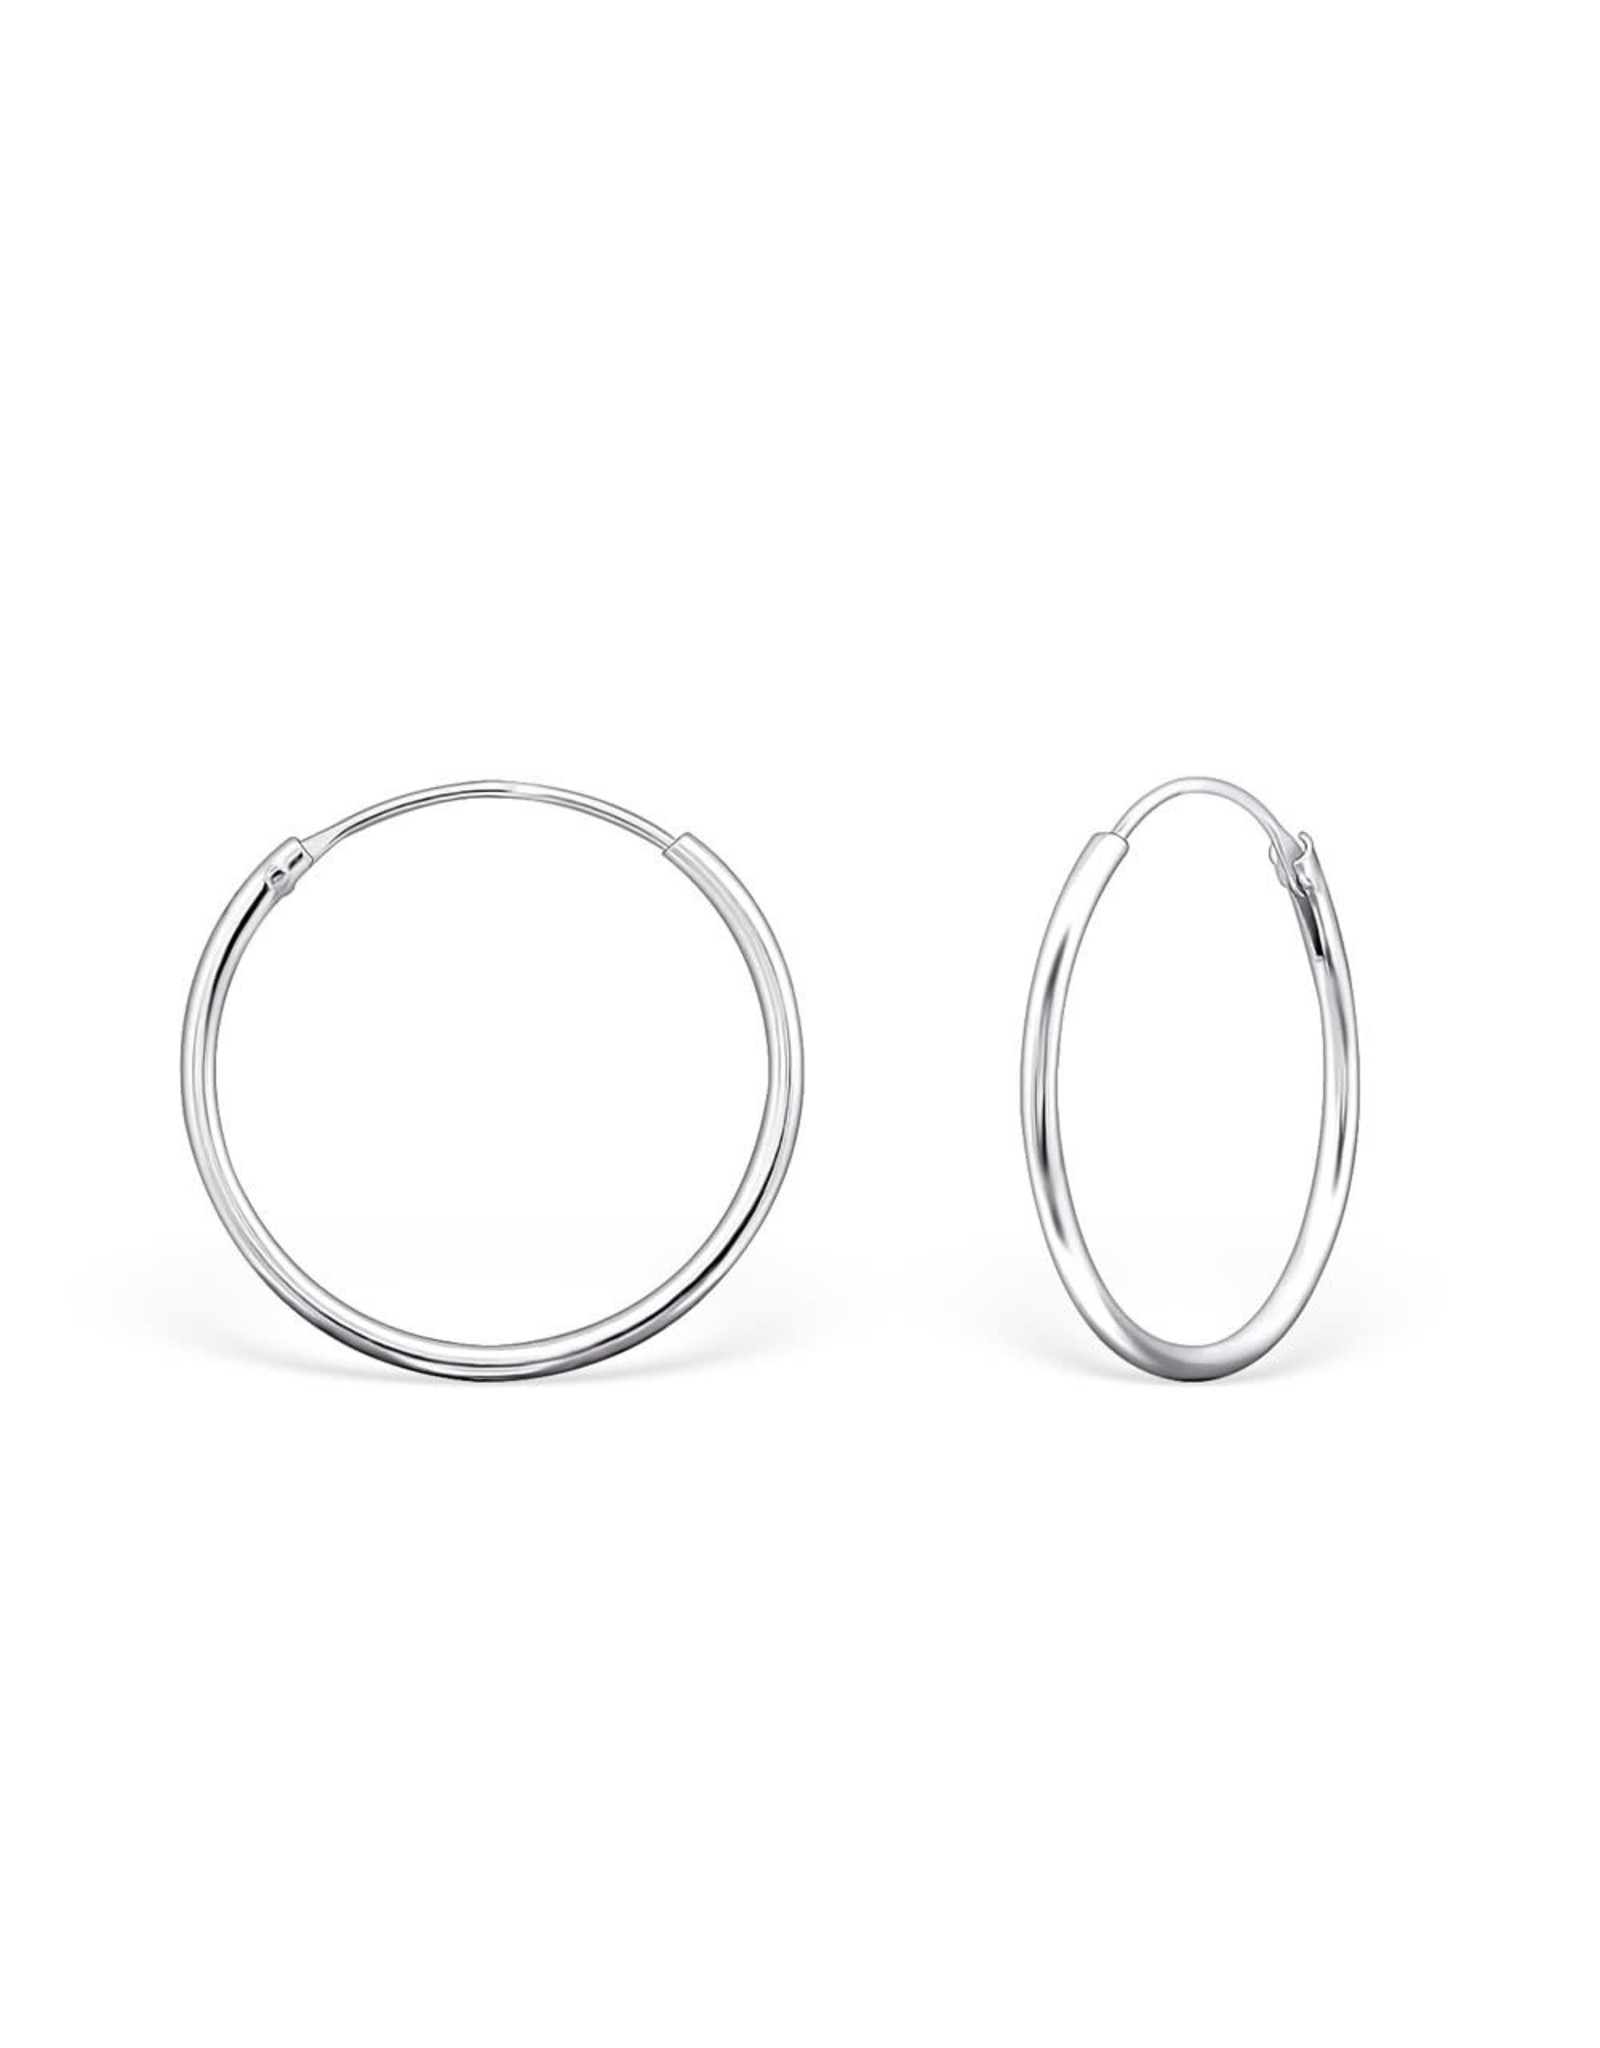 Ringetjes zilver 20mm